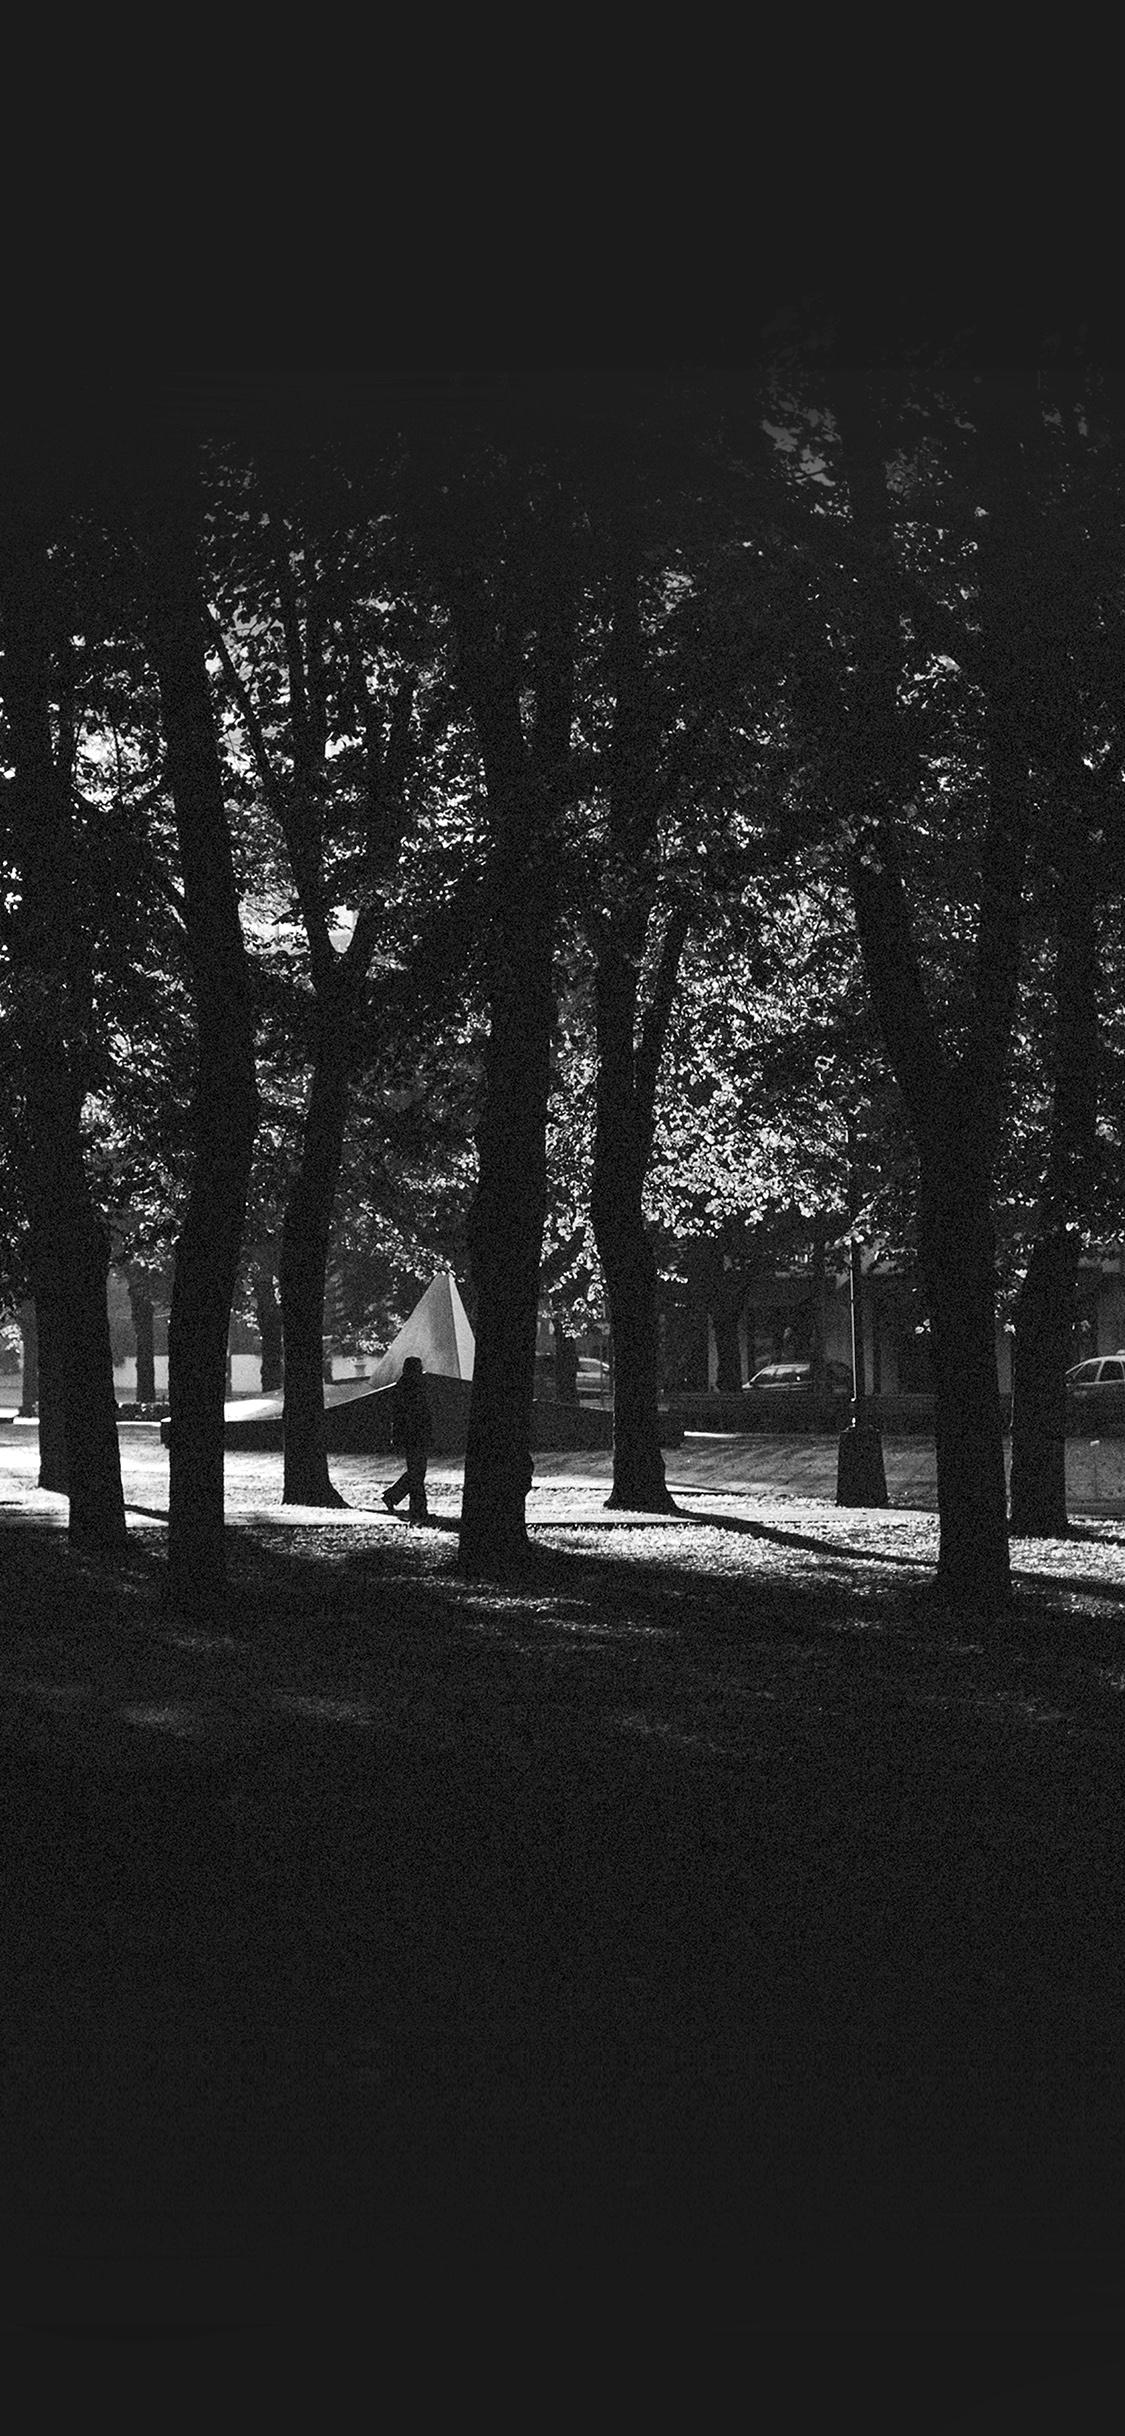 iPhonexpapers.com-Apple-iPhone-wallpaper-mo43-backyard-wood-dark-nature-in-city